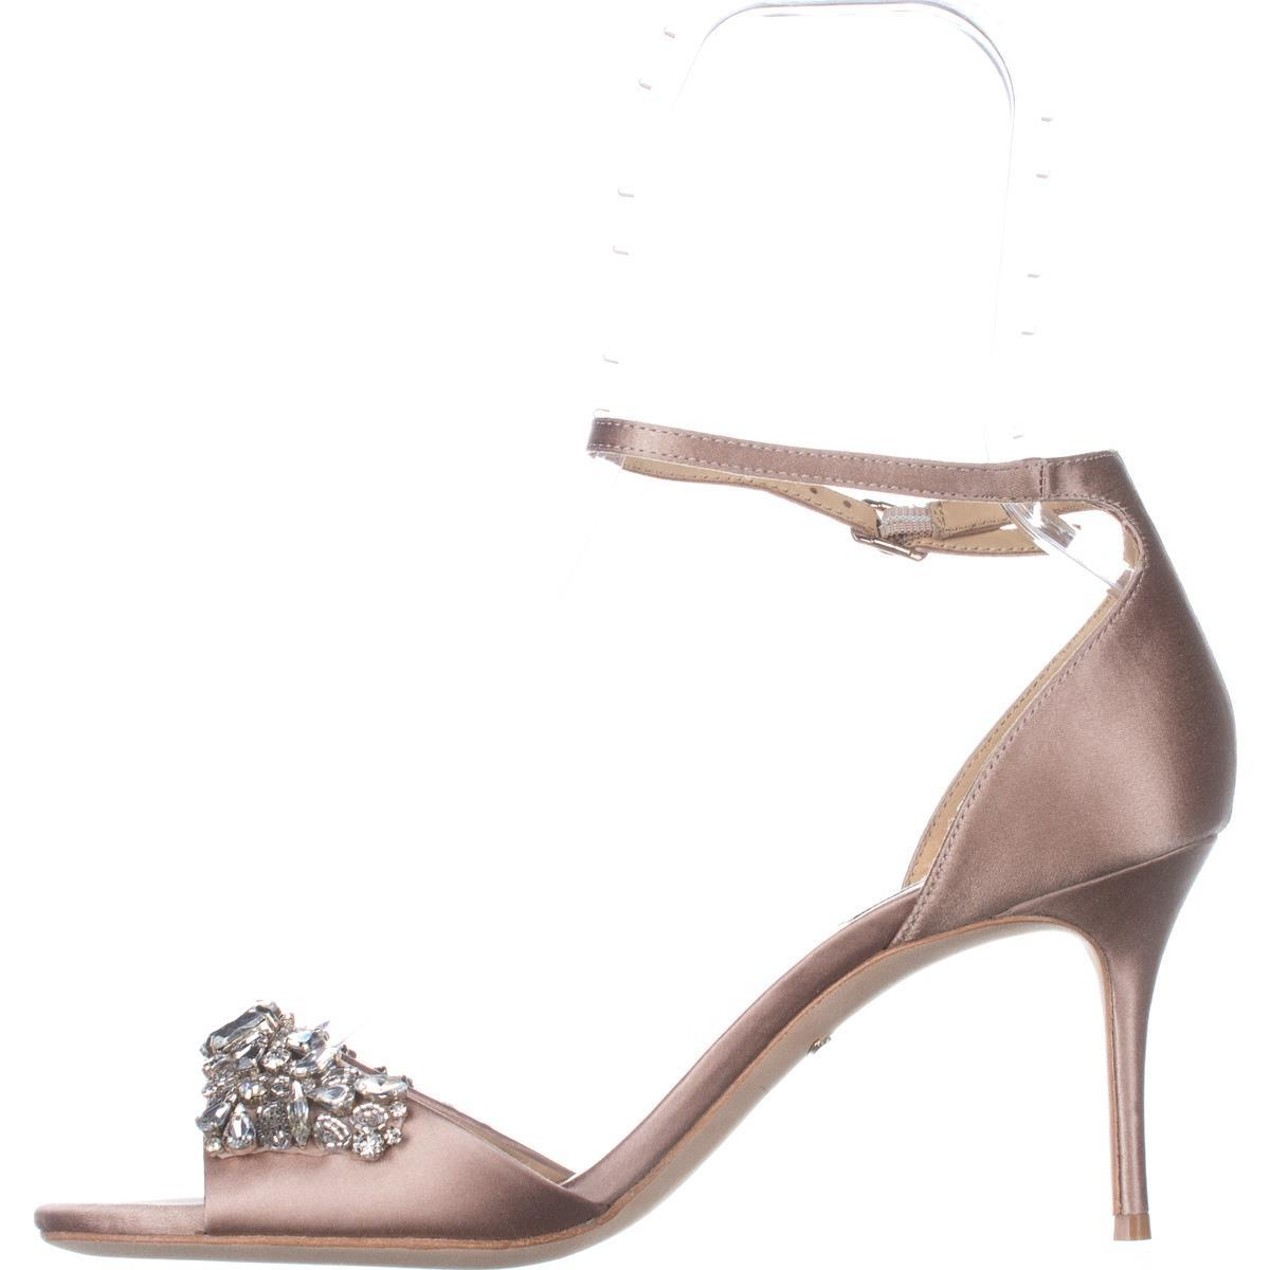 258f92448a6 ... Latte Badgley Mischka Bankston Ankle-Strap Dress Sandals